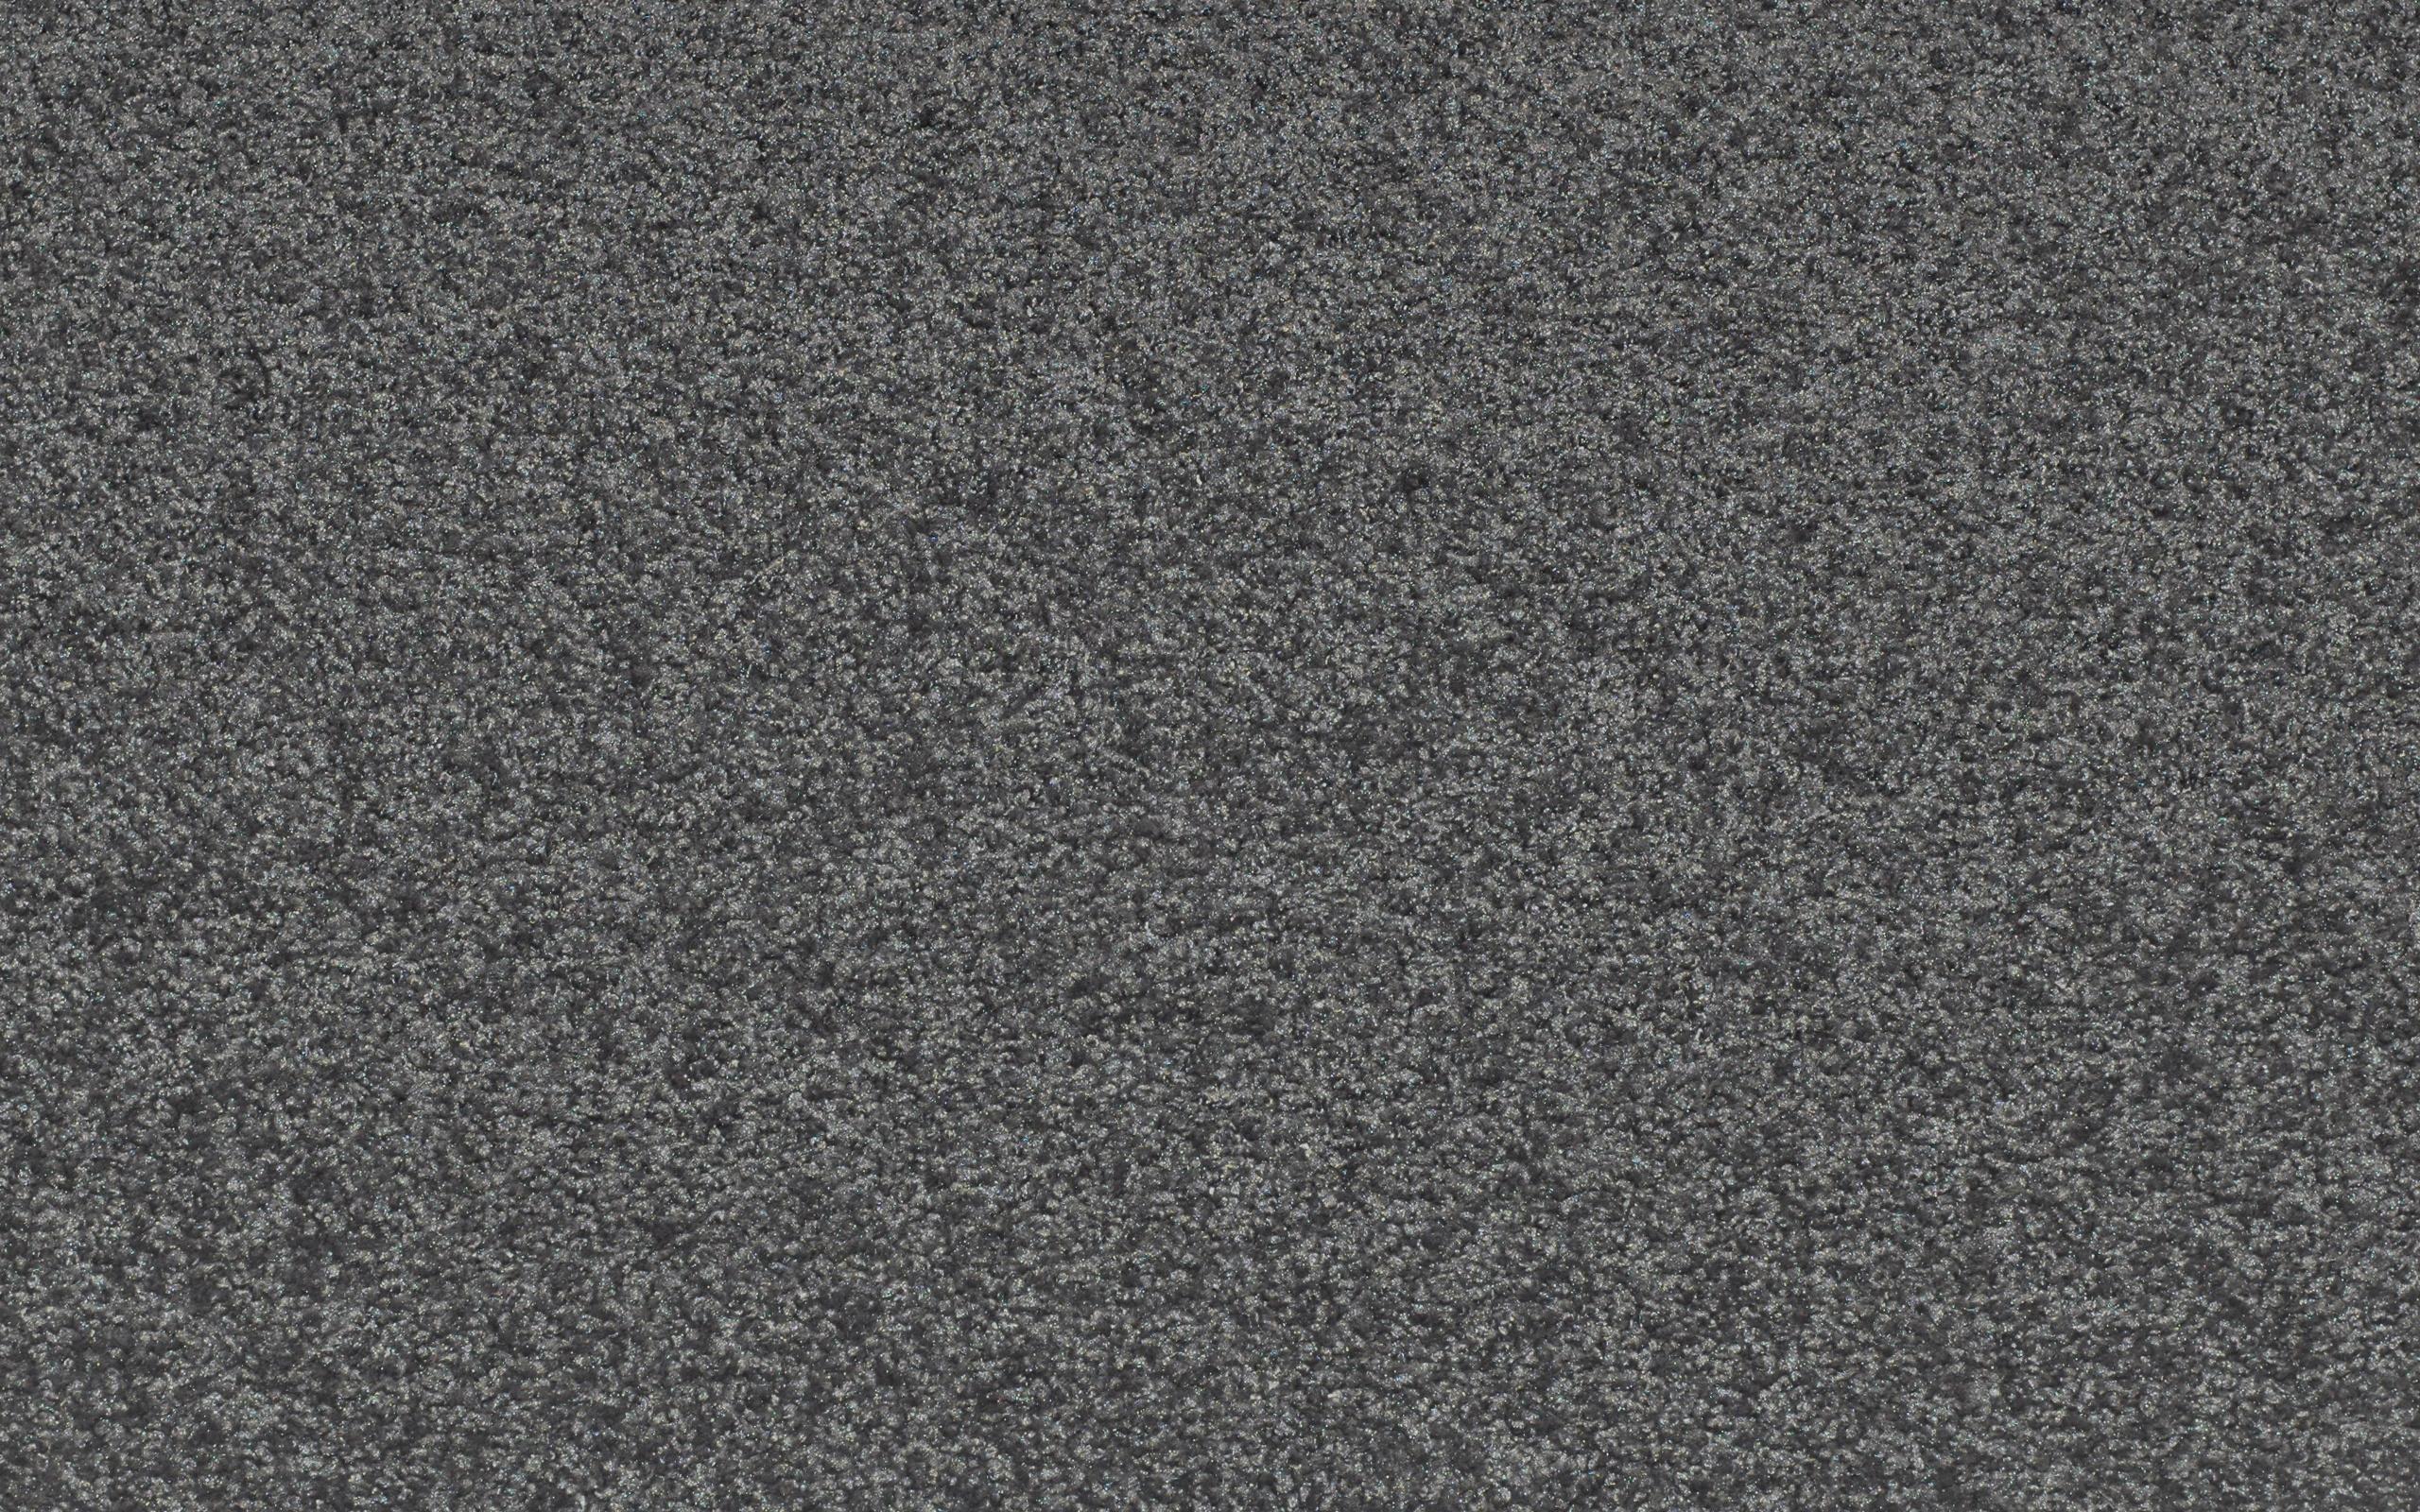 Wallpaper Surface Gray Carpet Background 2560x1600 Goodfon 734275 Hd Wallpapers Wallhere